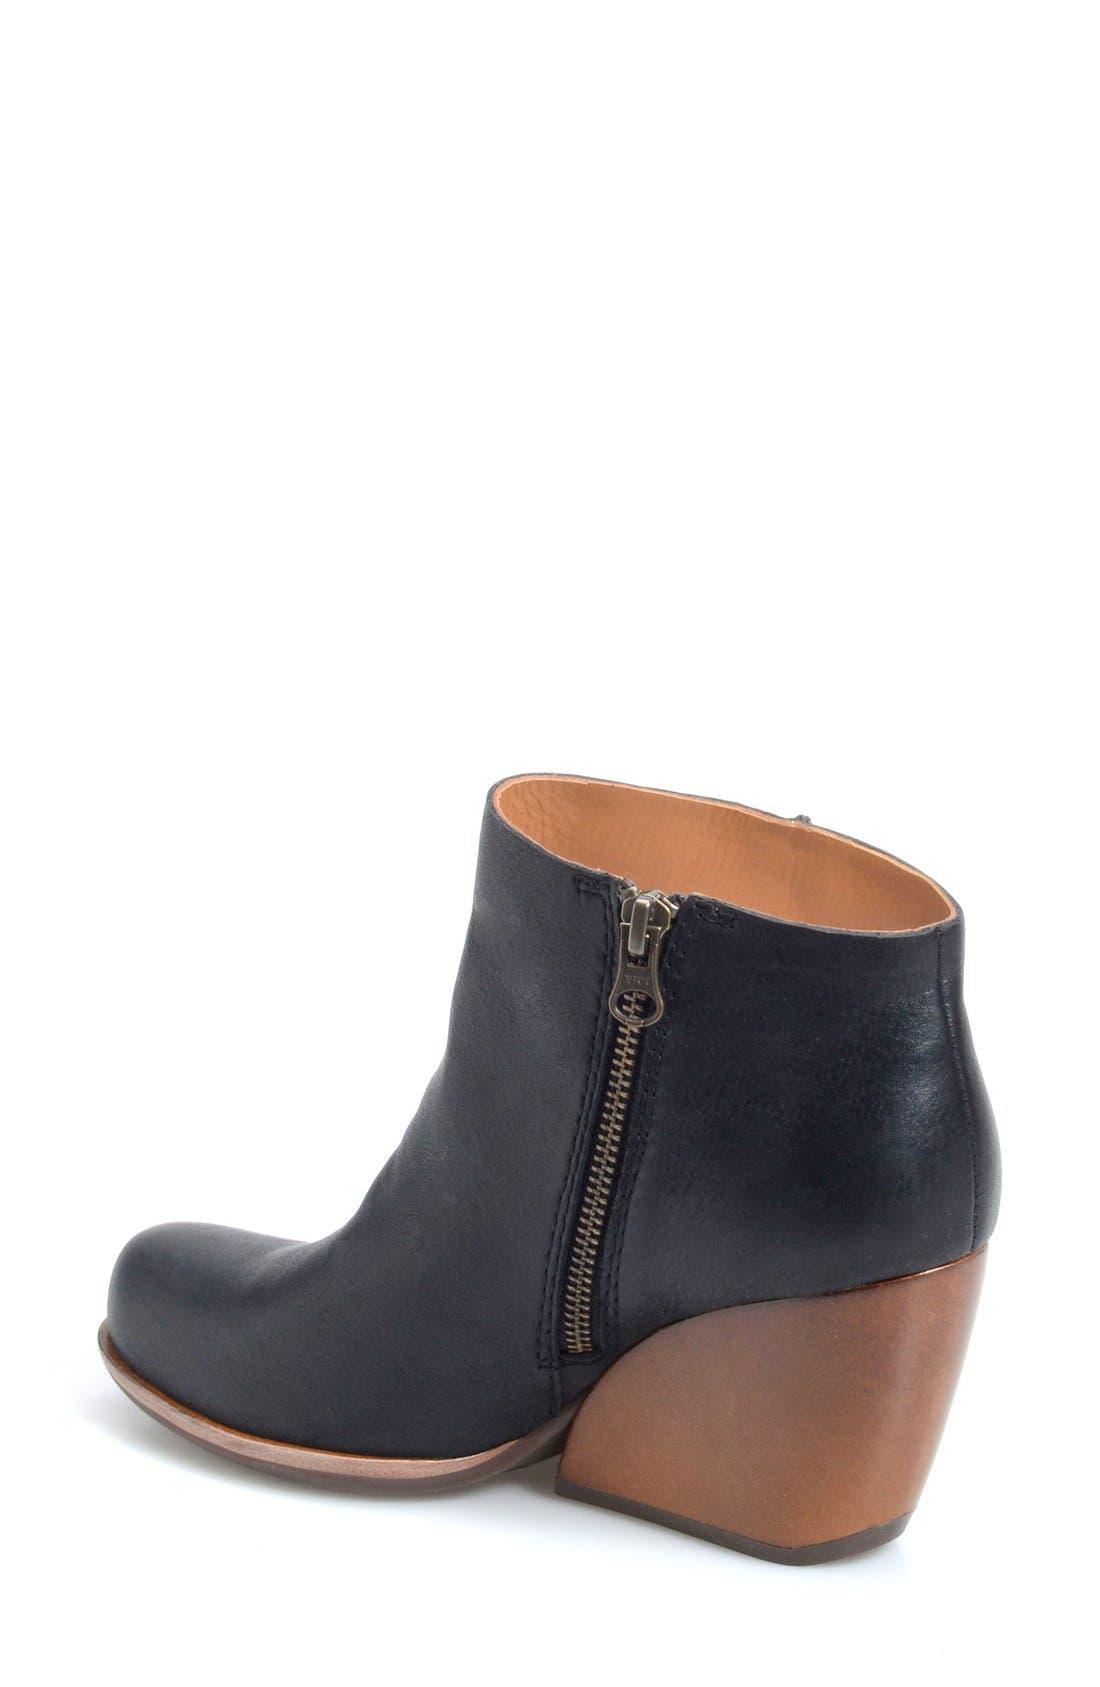 'Natalya' Burnished Leather Demi Wedge Boot,                             Alternate thumbnail 5, color,                             001